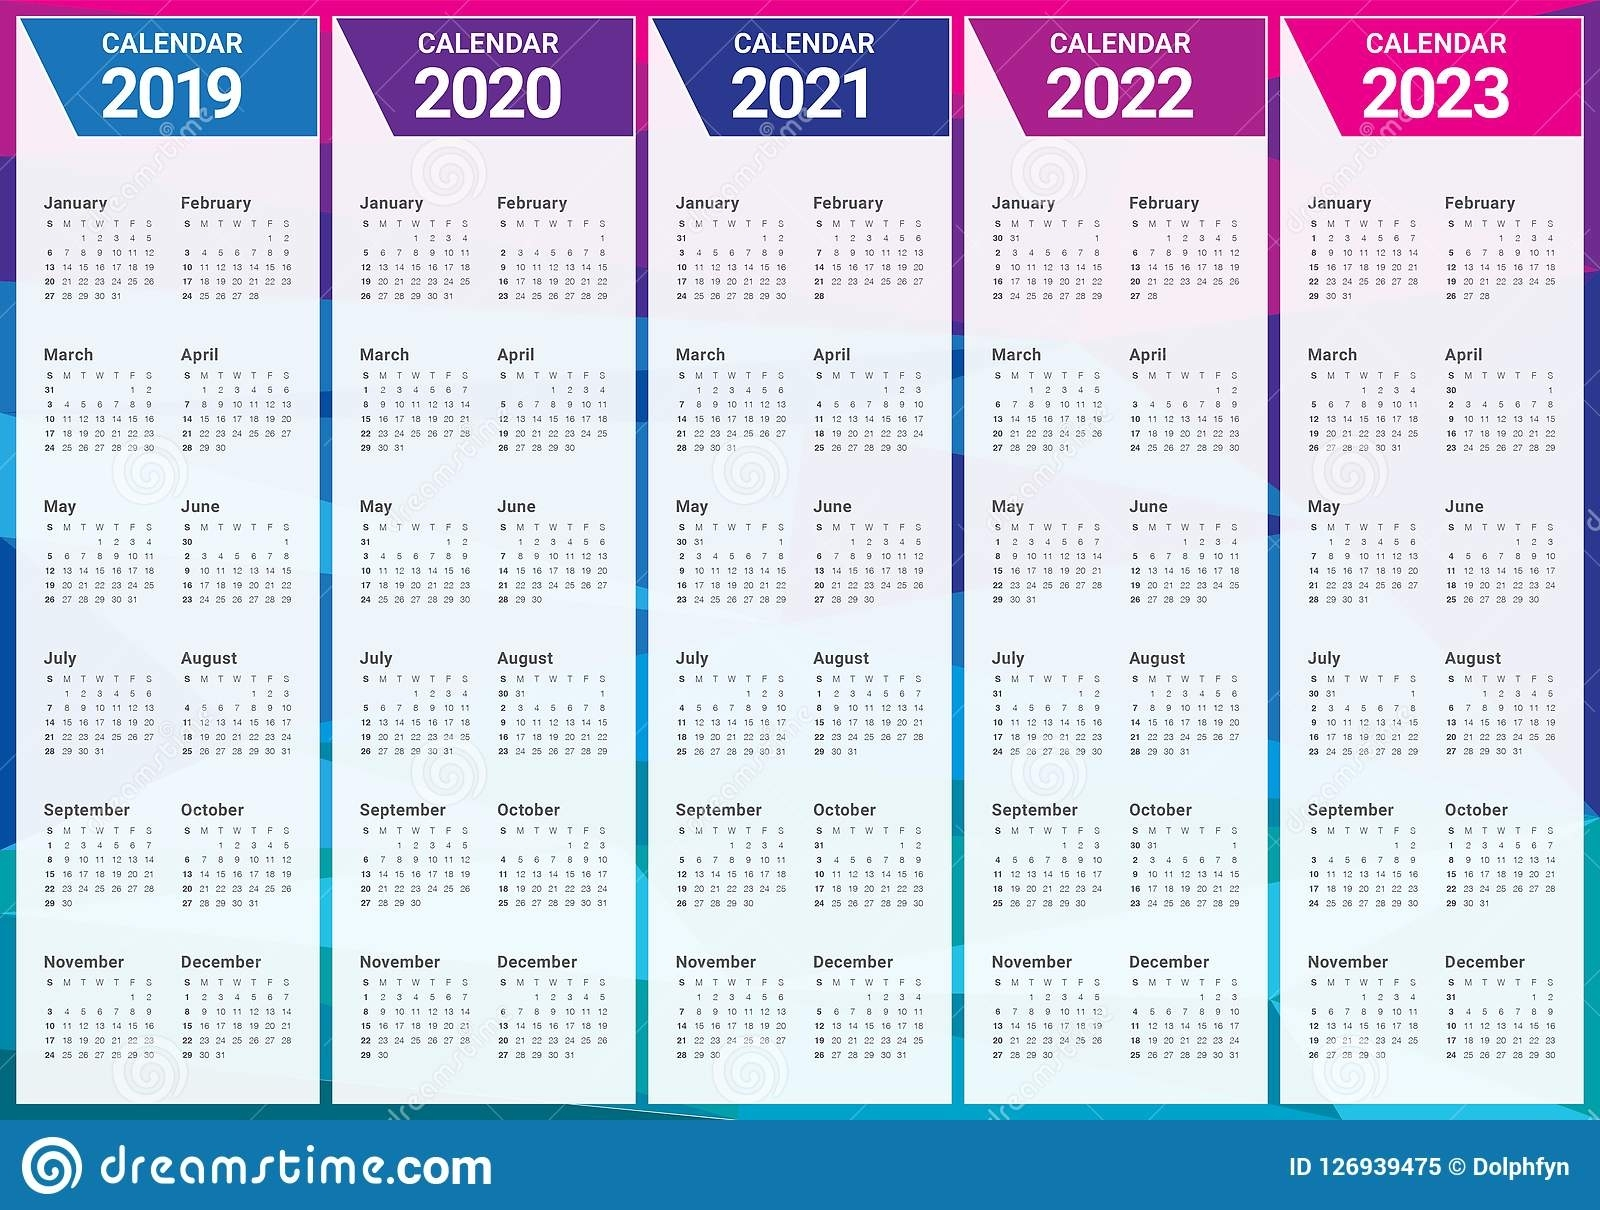 Year 2019 2020 2021 2022 2023 Calendar Vector Design pertaining to Calendar Years 2019 2020 2021 2022 2023